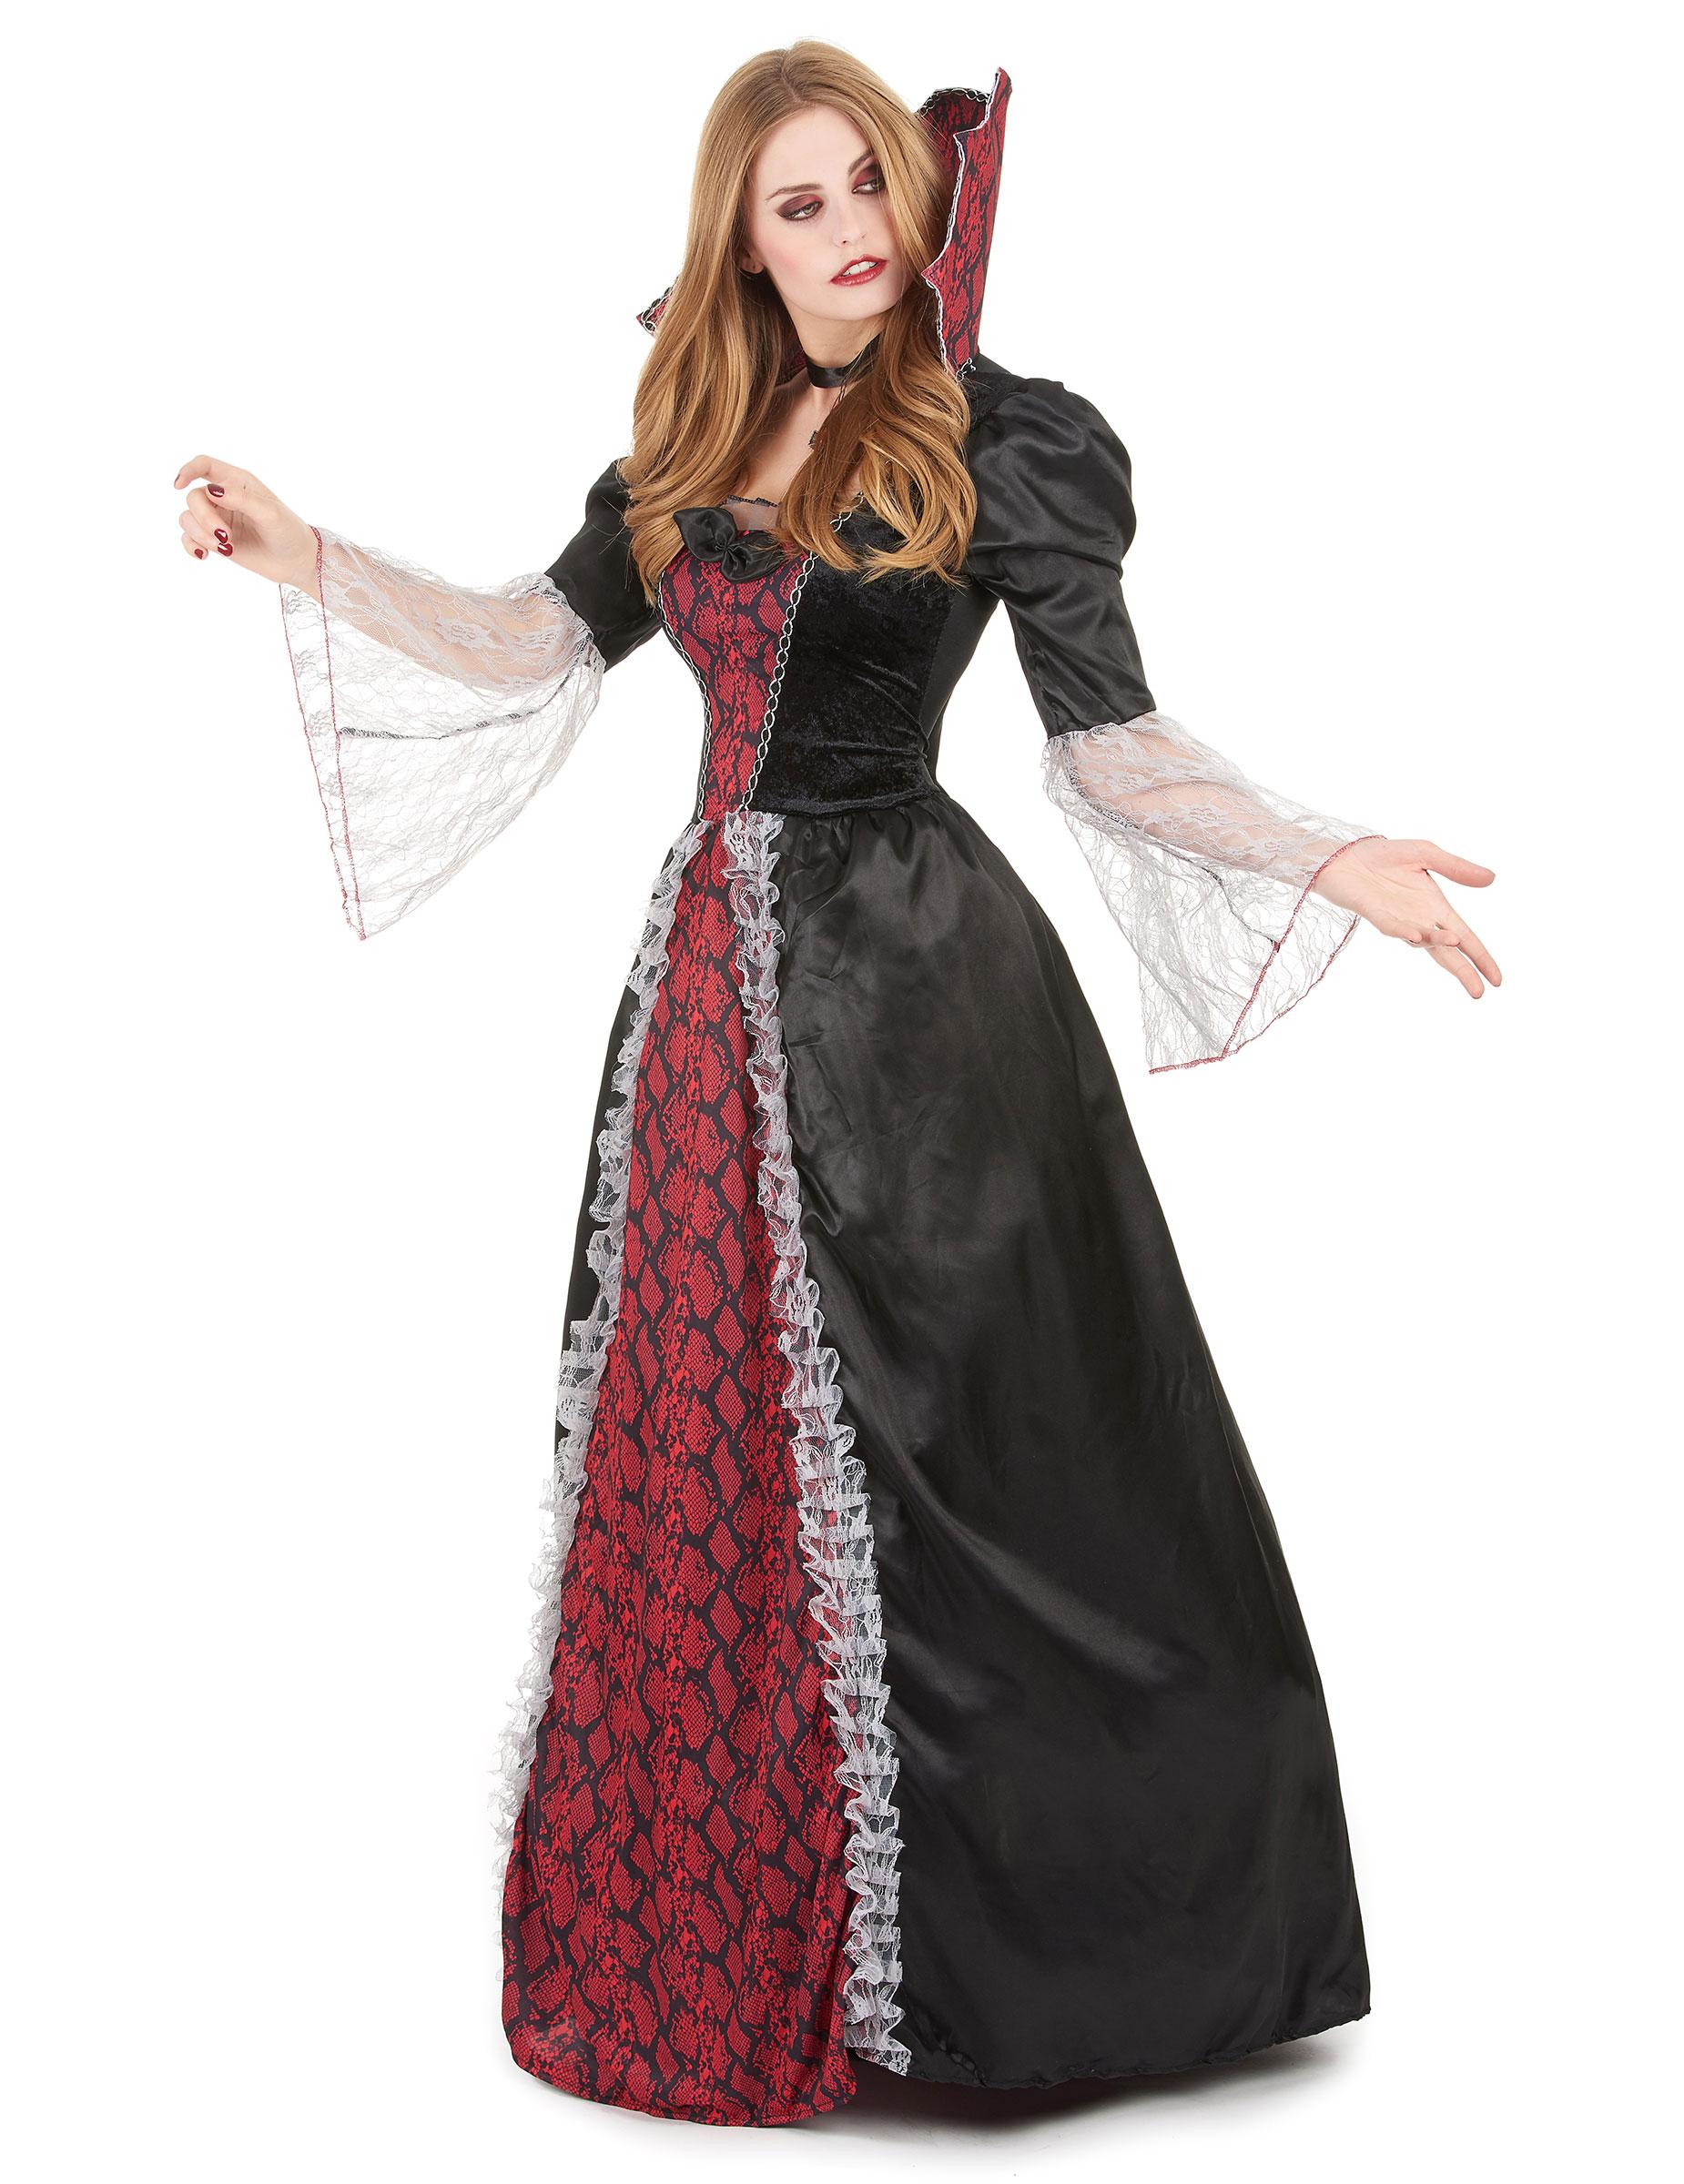 Déguisement deluxe vampire baroque femme   Deguise-toi, achat de ... 5594989516c8